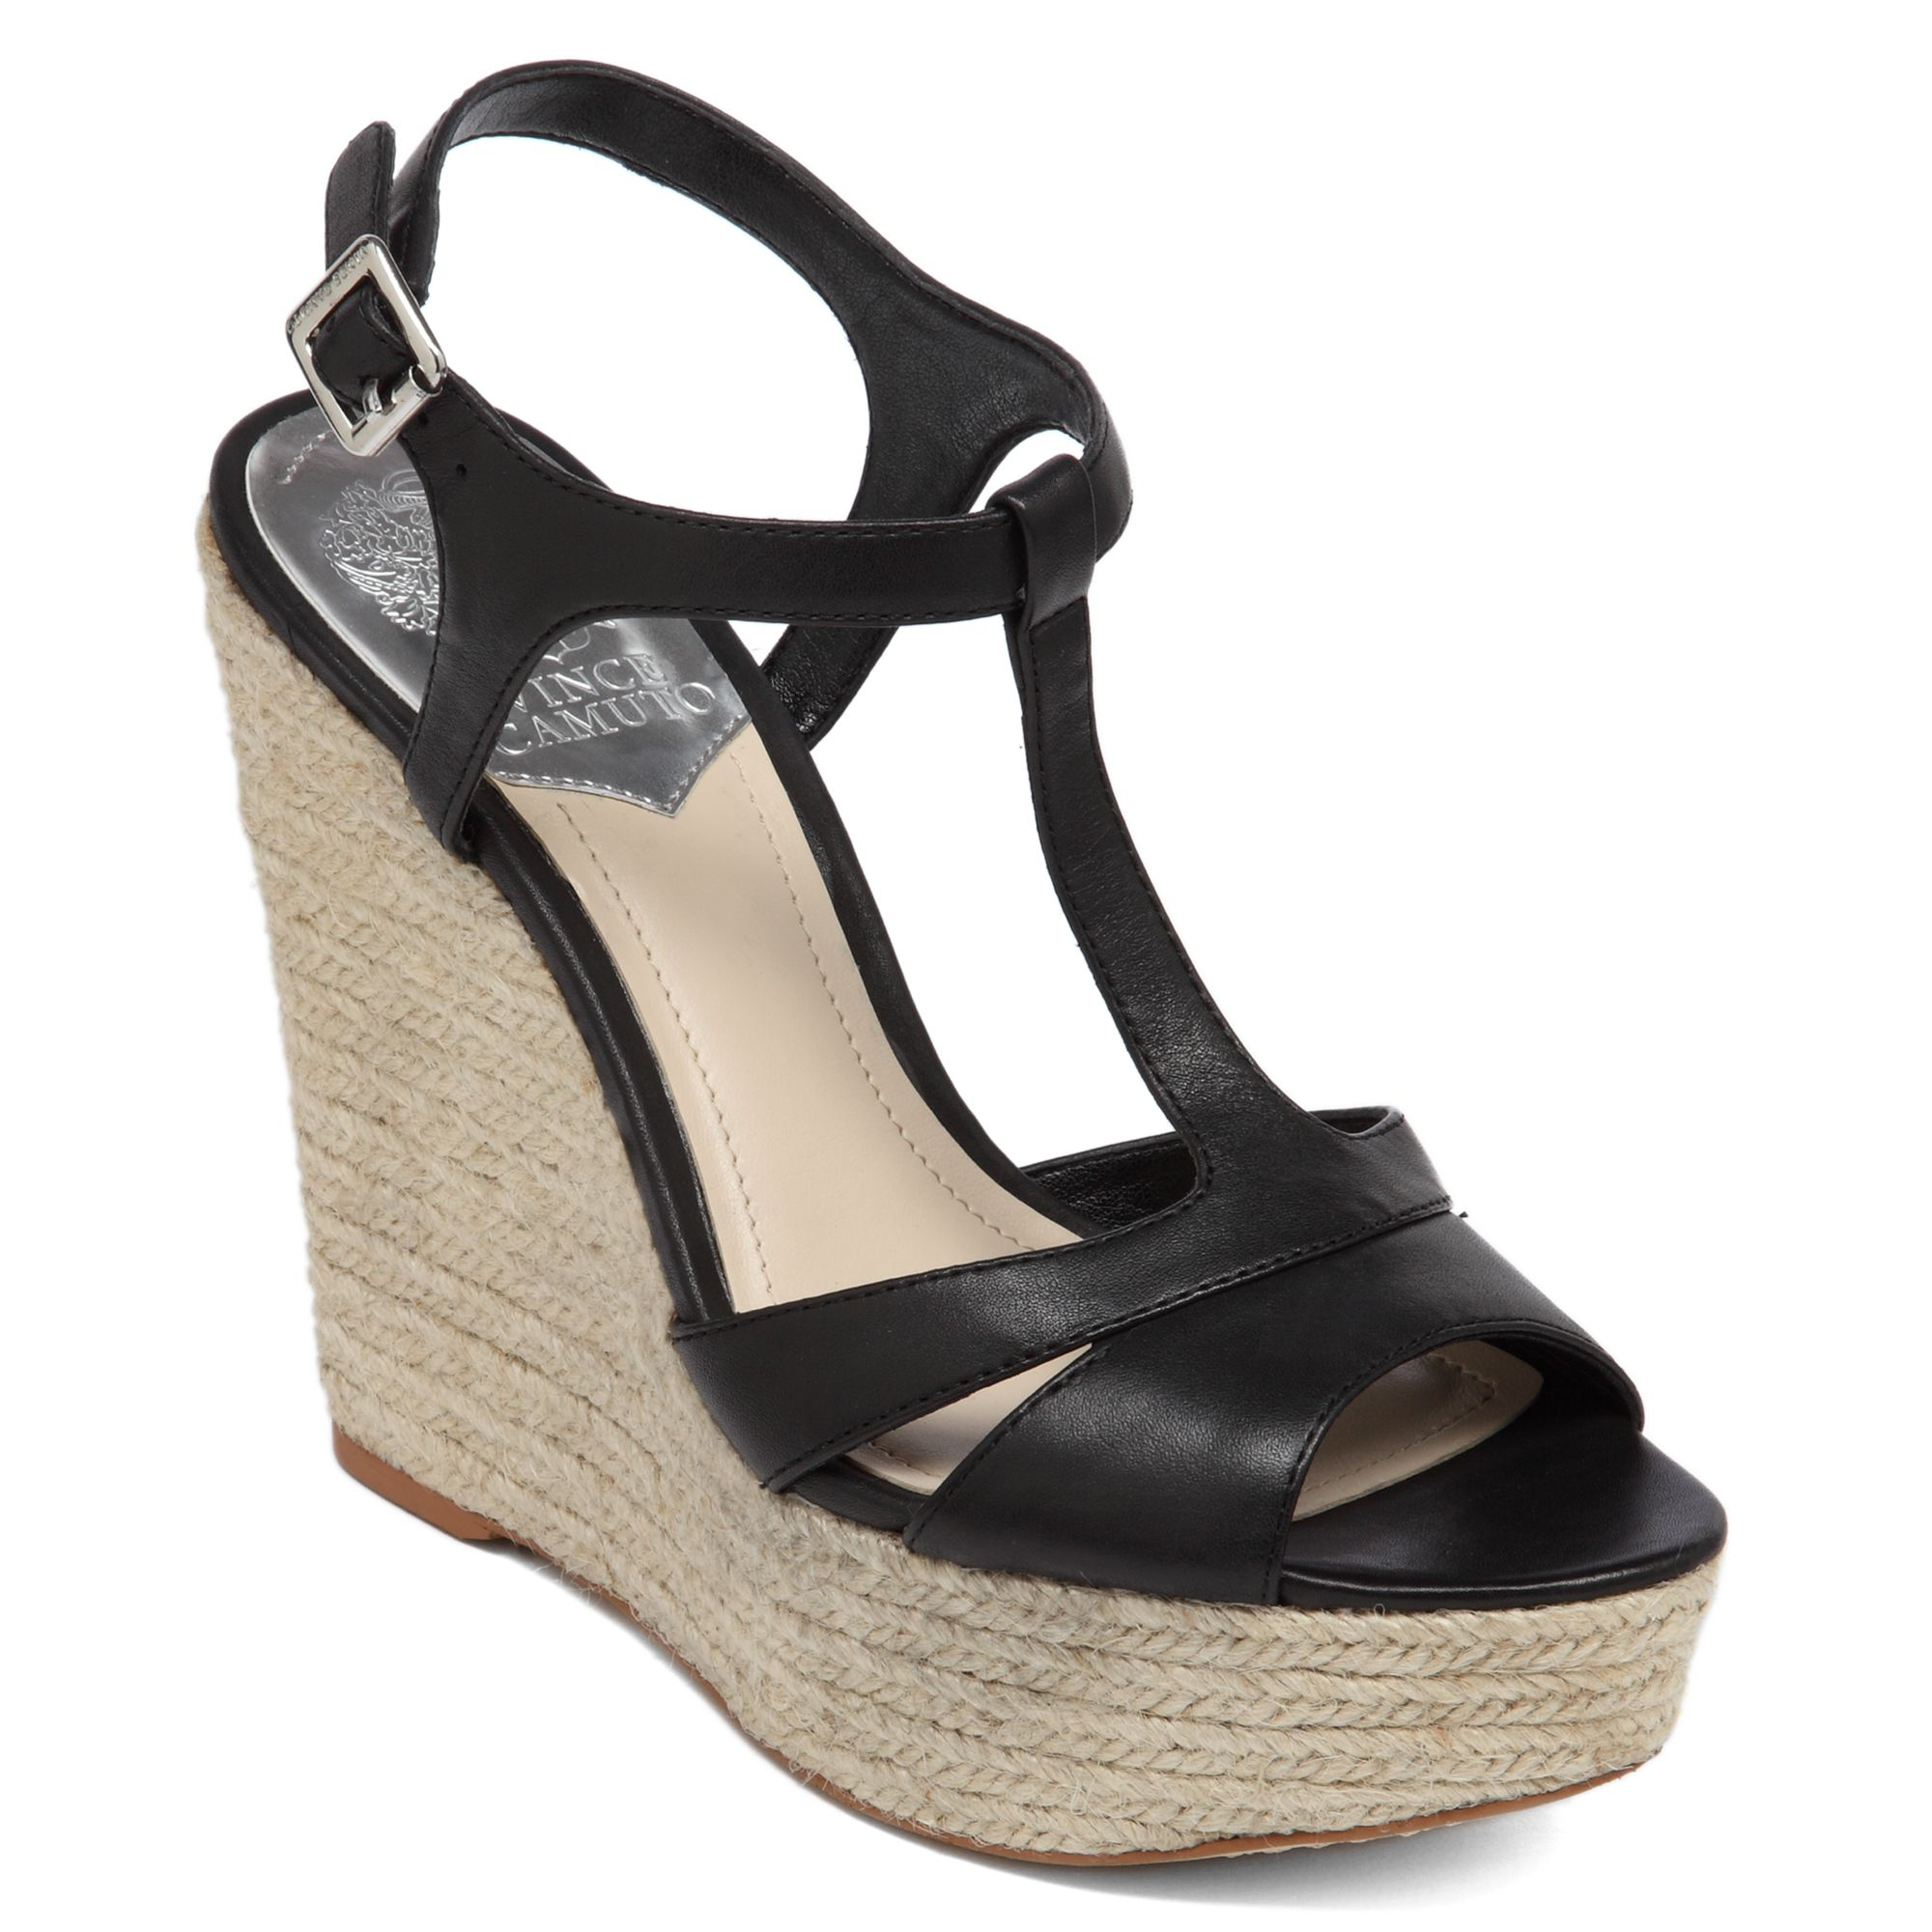 Vince Camuto Inslo2 Platform Wedge Sandals In Black Lyst